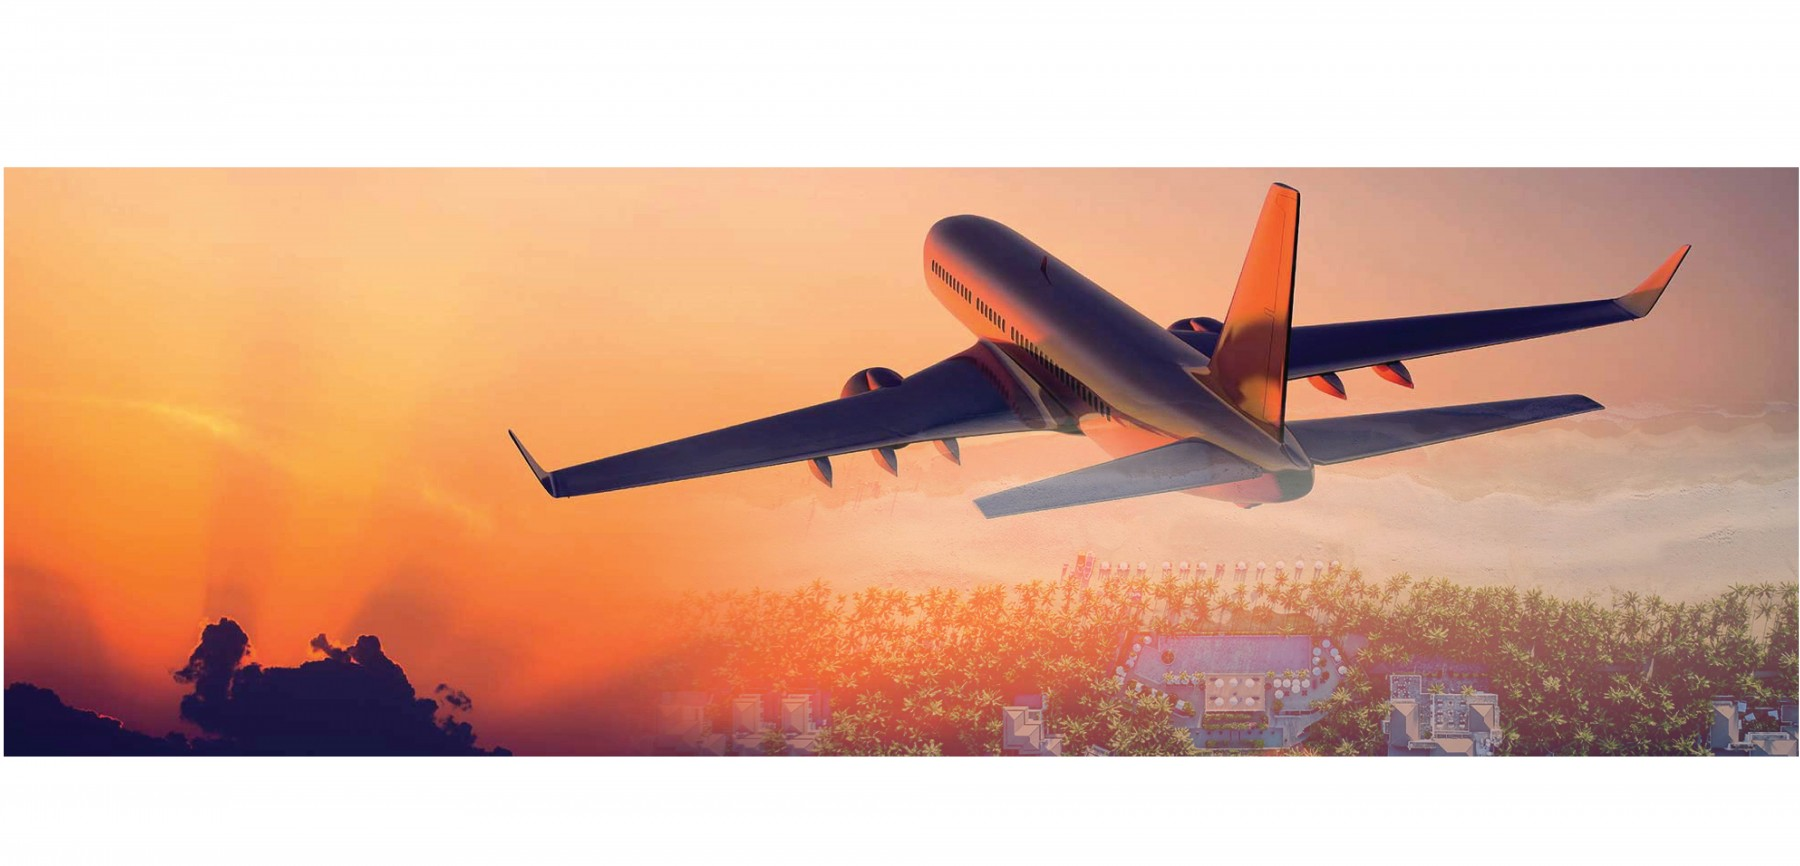 tron-goi-uu-dai-nghi-duong-5-sao-ket-hop-giua-vietnam-airlines-va-premier-village-danang-resort